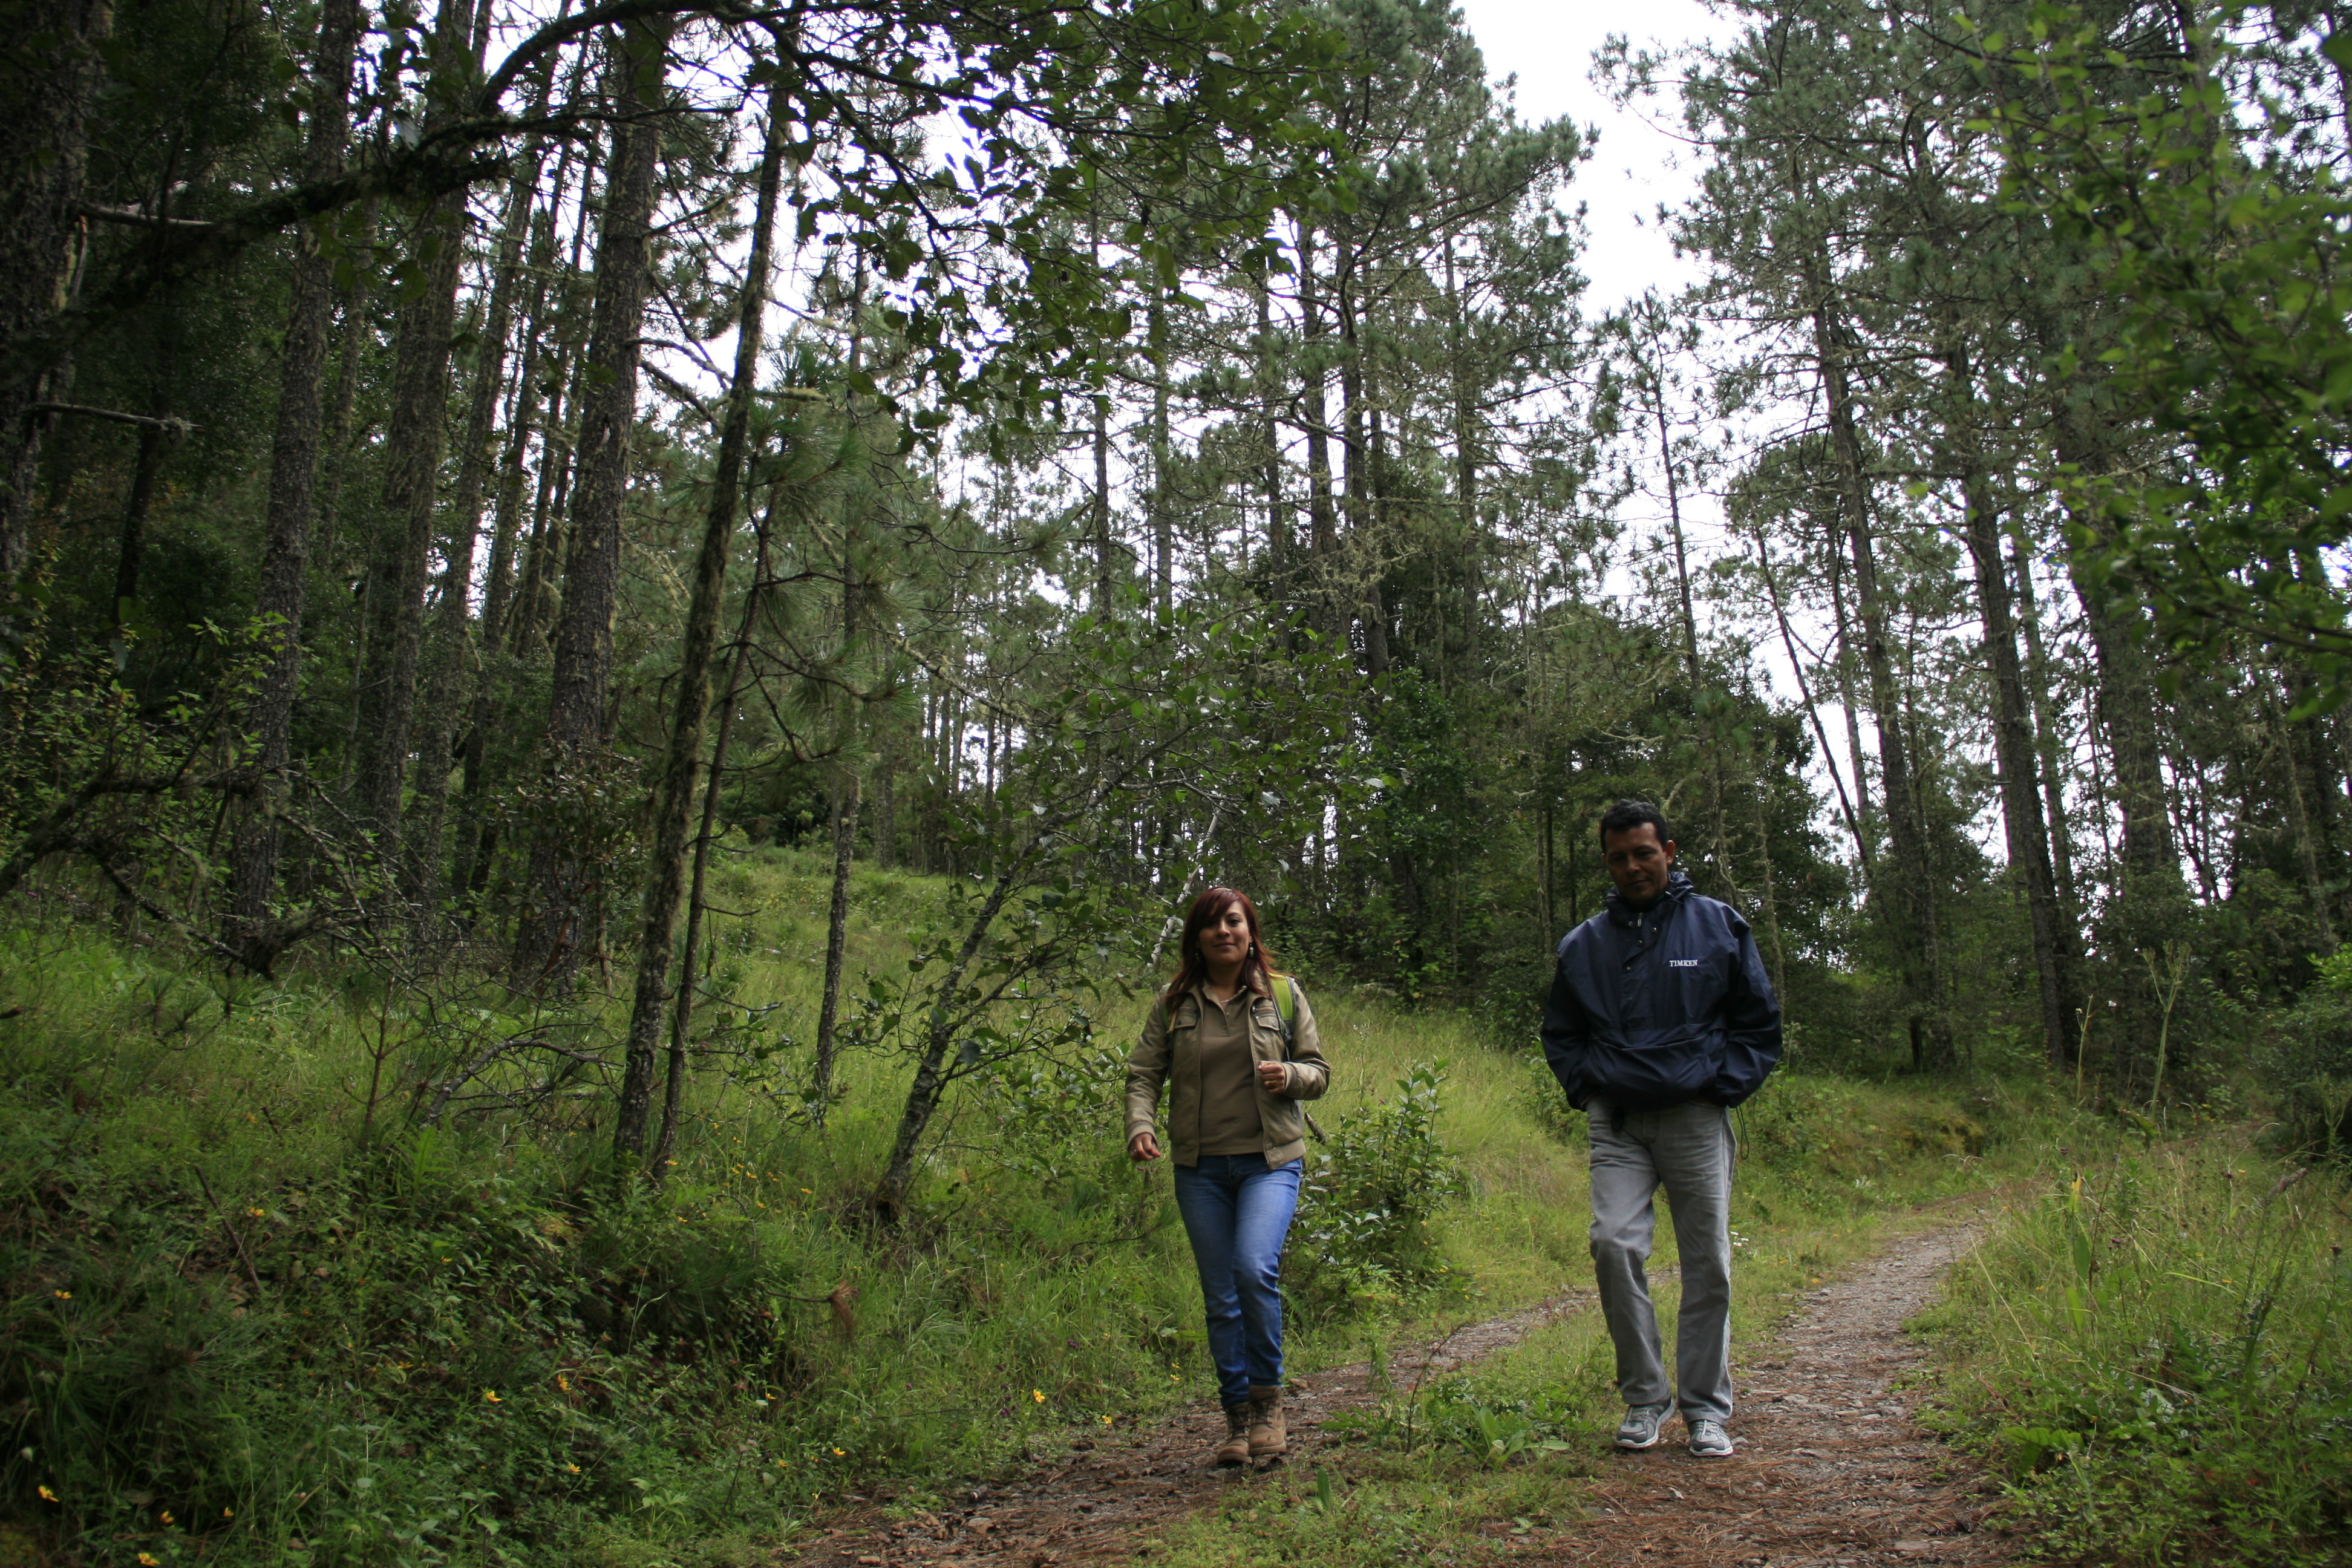 angelica-walking-trail.JPG